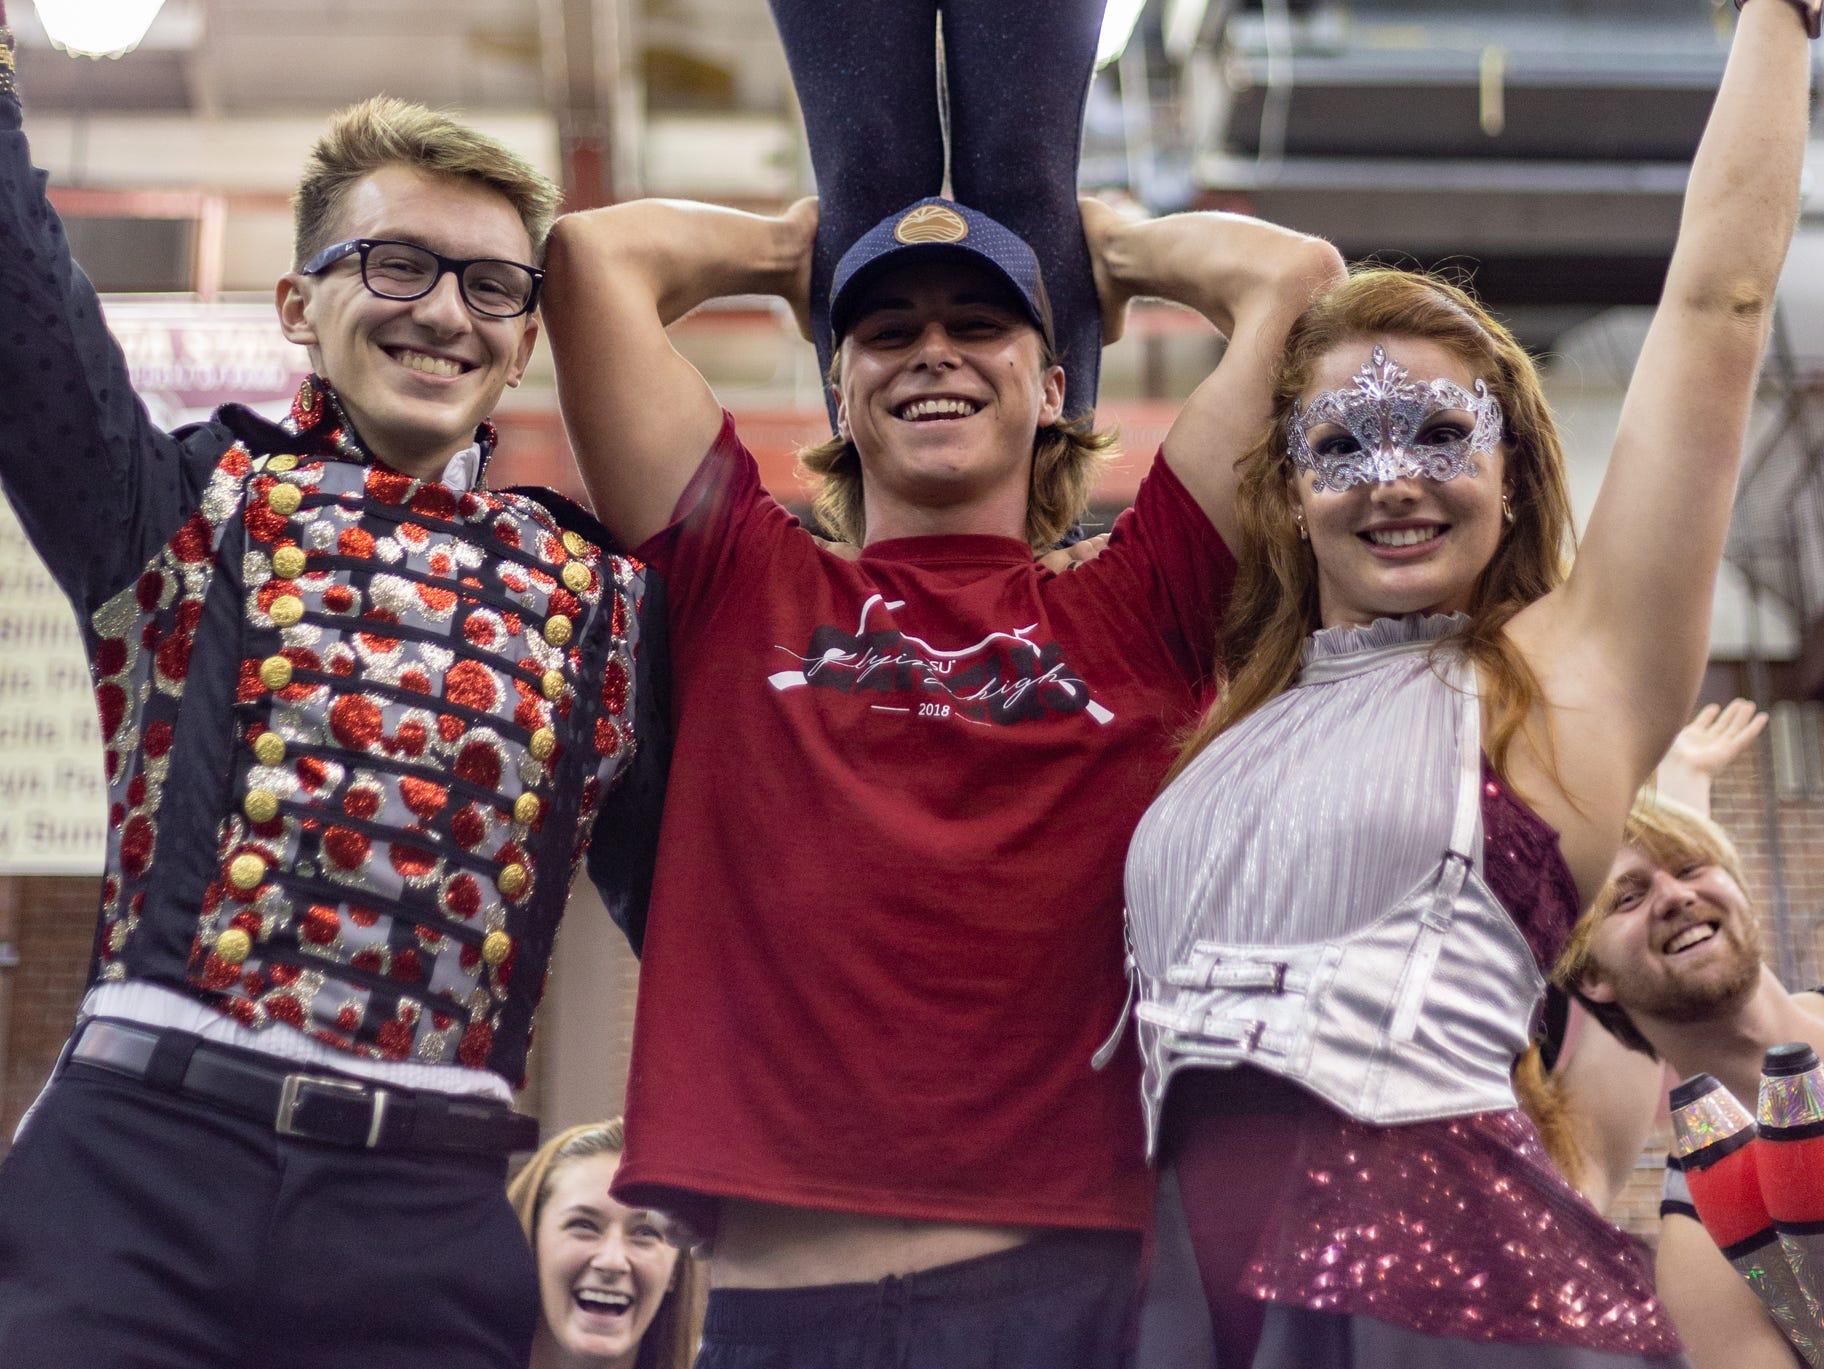 Anshley Sanders (top), Adam Rhodes (left), Dalton Leclair (center), and Brooke Garringer (right) show off their circus skills on Tuesday at FSU's Involvement Fair in the Leach Center.